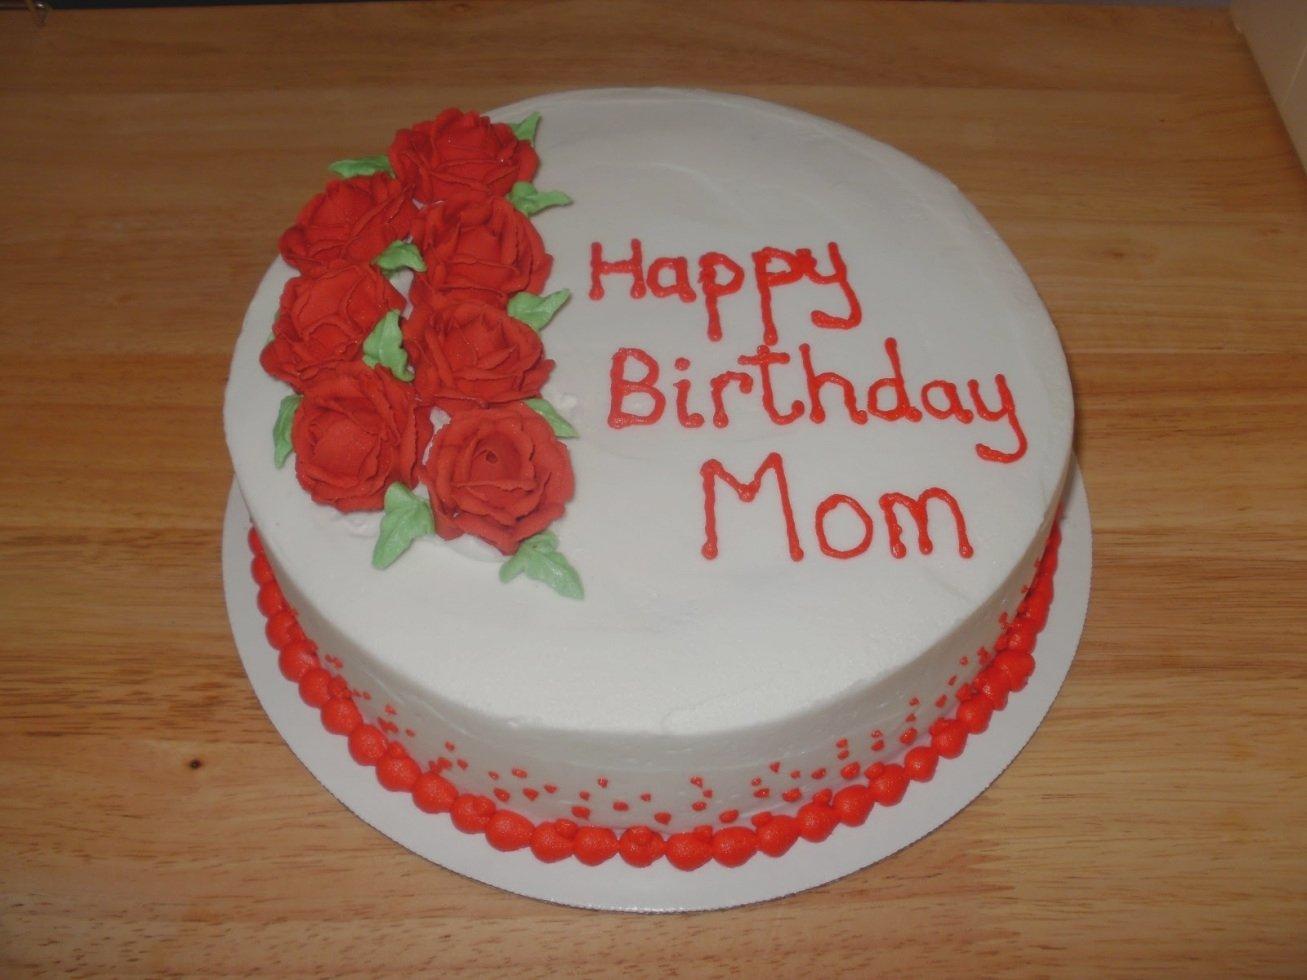 10 Fashionable Birthday Cake Ideas For Mom awesome mother birthday cake fun cakes mom pinterest 2018 birthday 2021